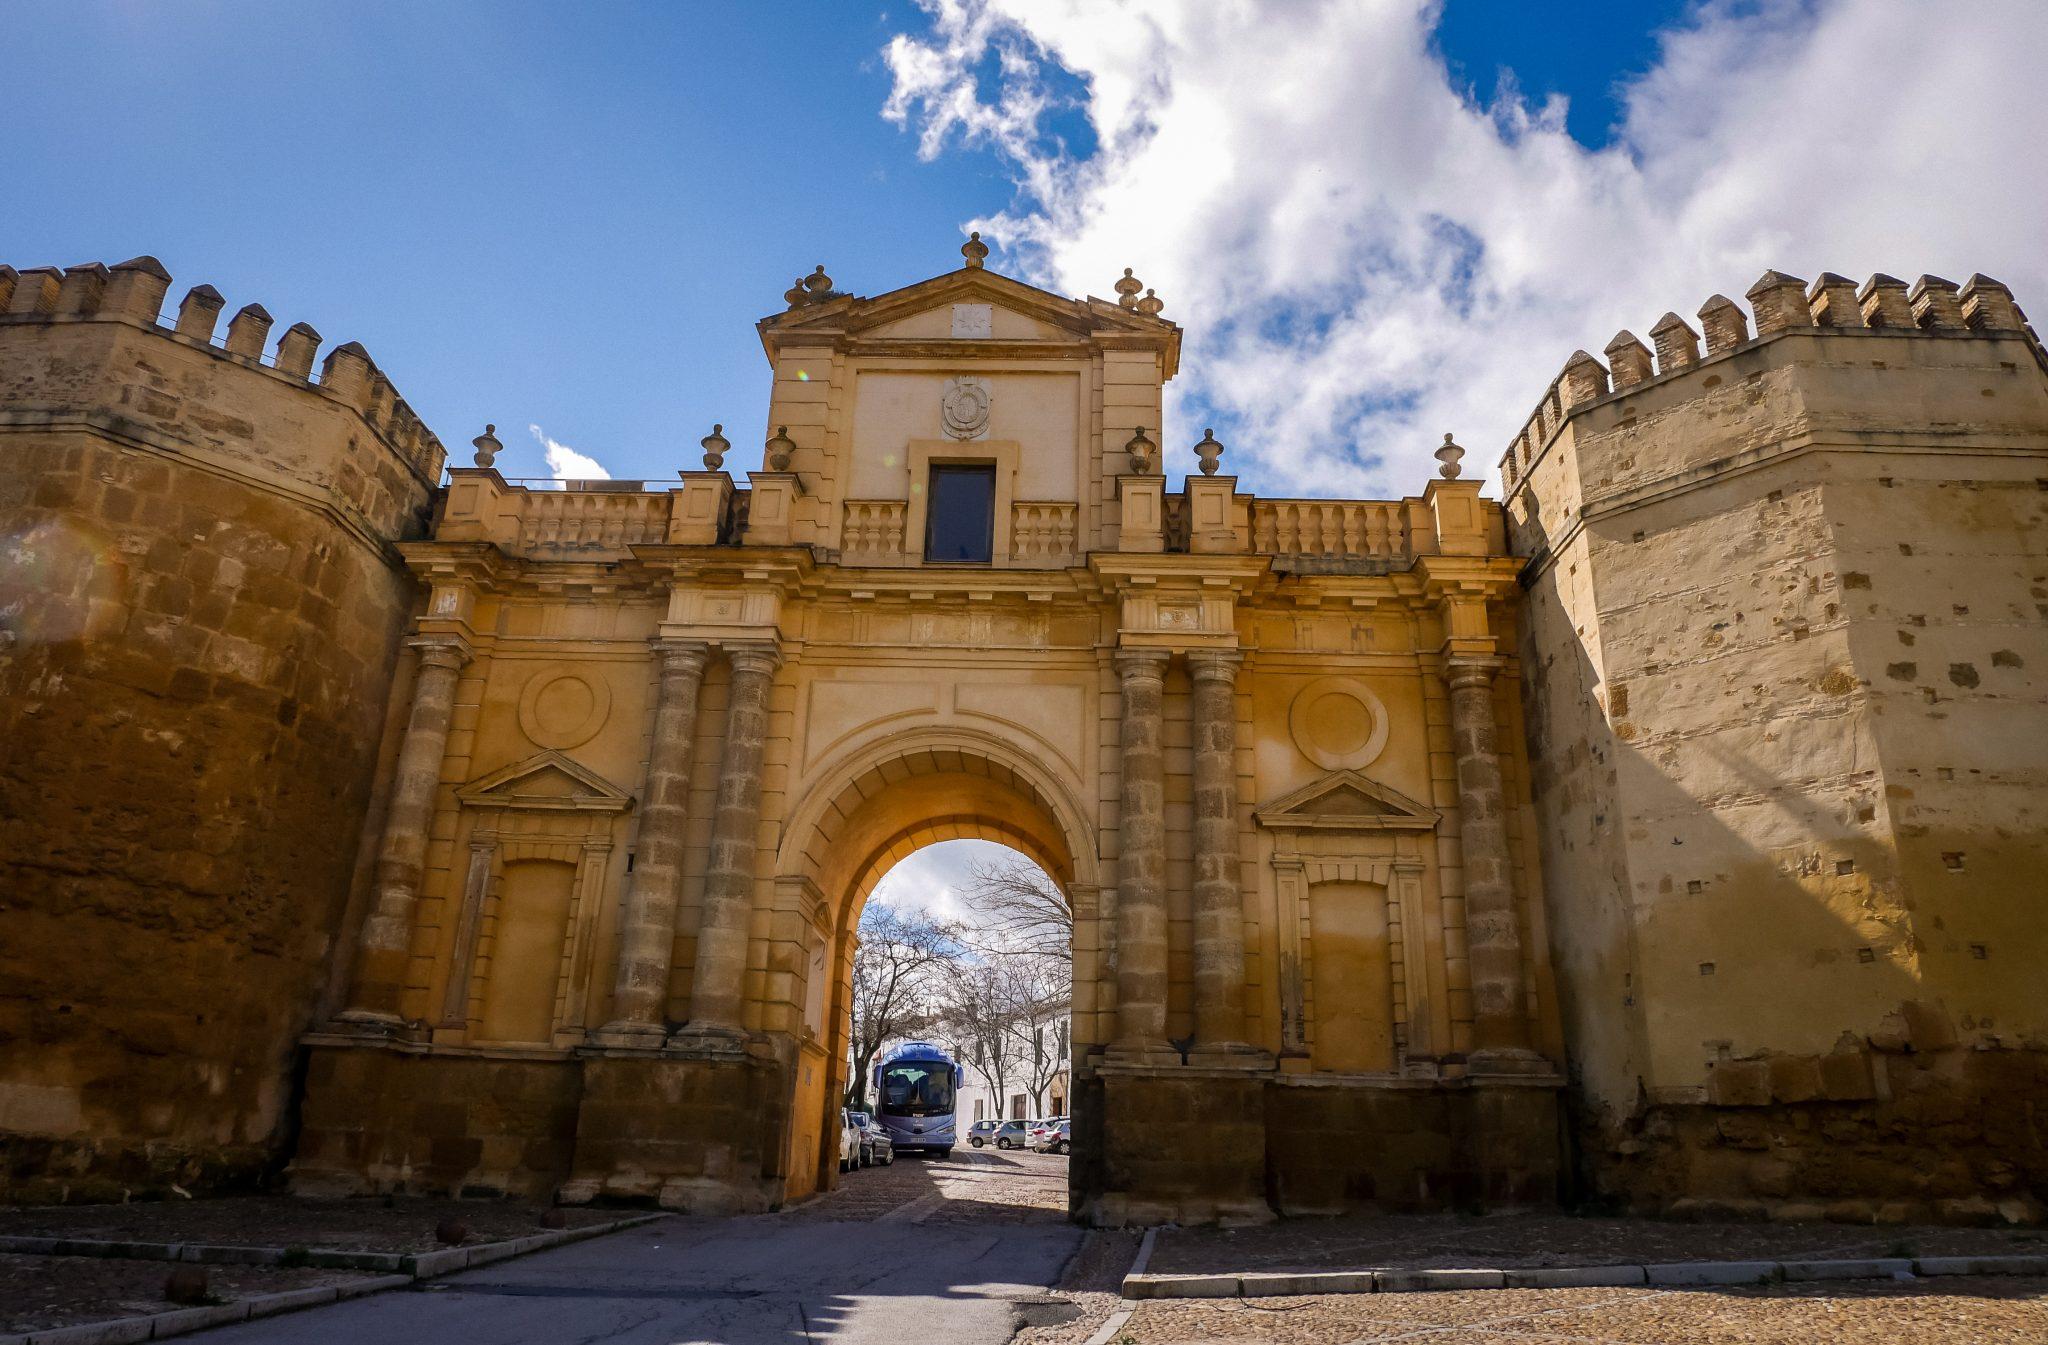 Dies ist das frühere Stadttor Puerta de Córdoba, dahinter ist die Altstadt.